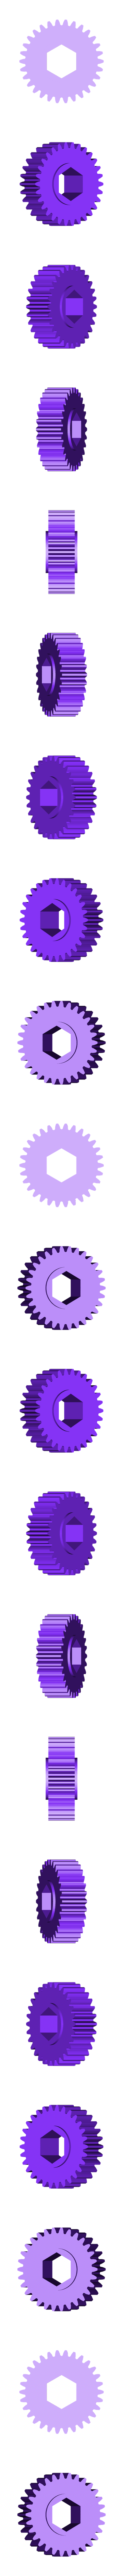 Sun gear.stl Download free STL file Clockwork pen carousel • 3D printing template, EvolvingExtrusions